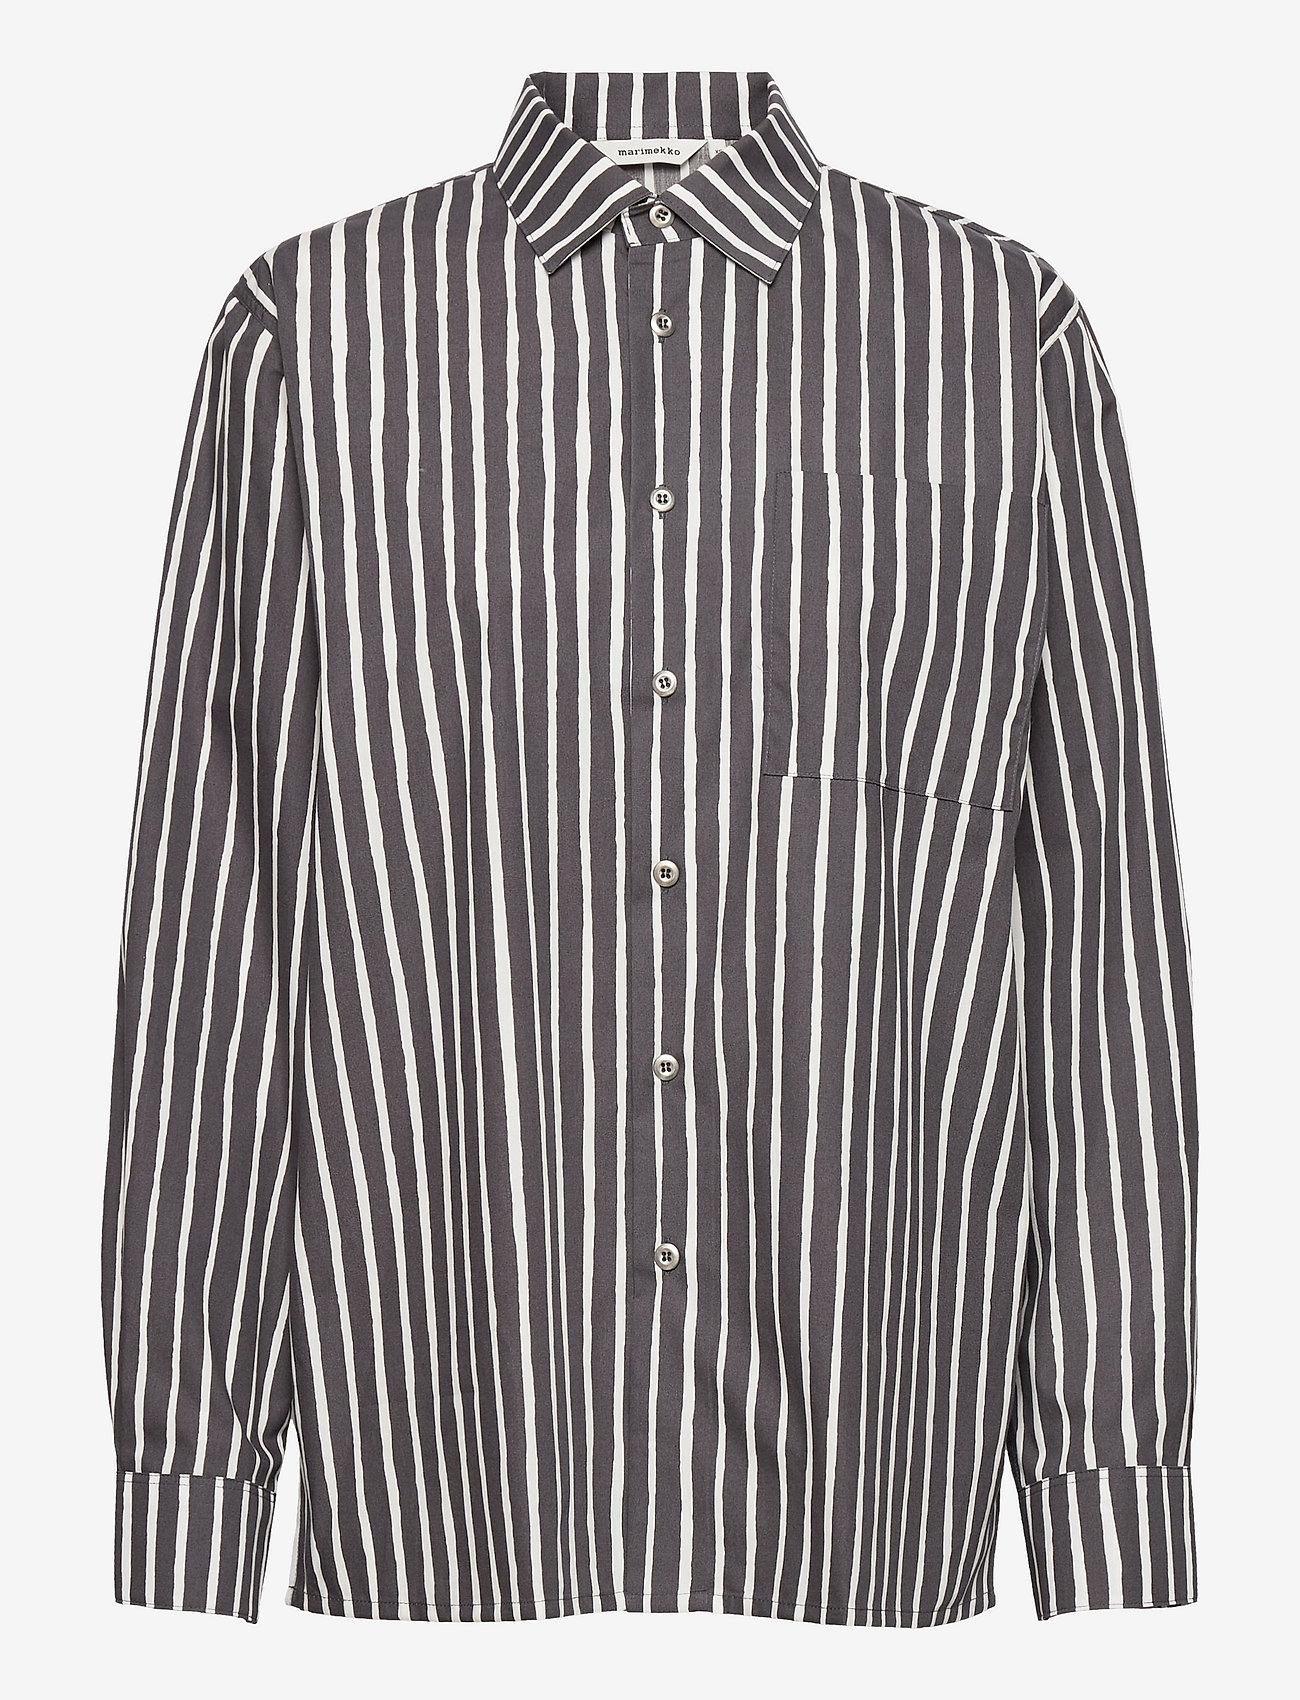 Marimekko - JOKAPOIKA 2017 SHIRT - denimskjorter - sustainable color, bown - 0